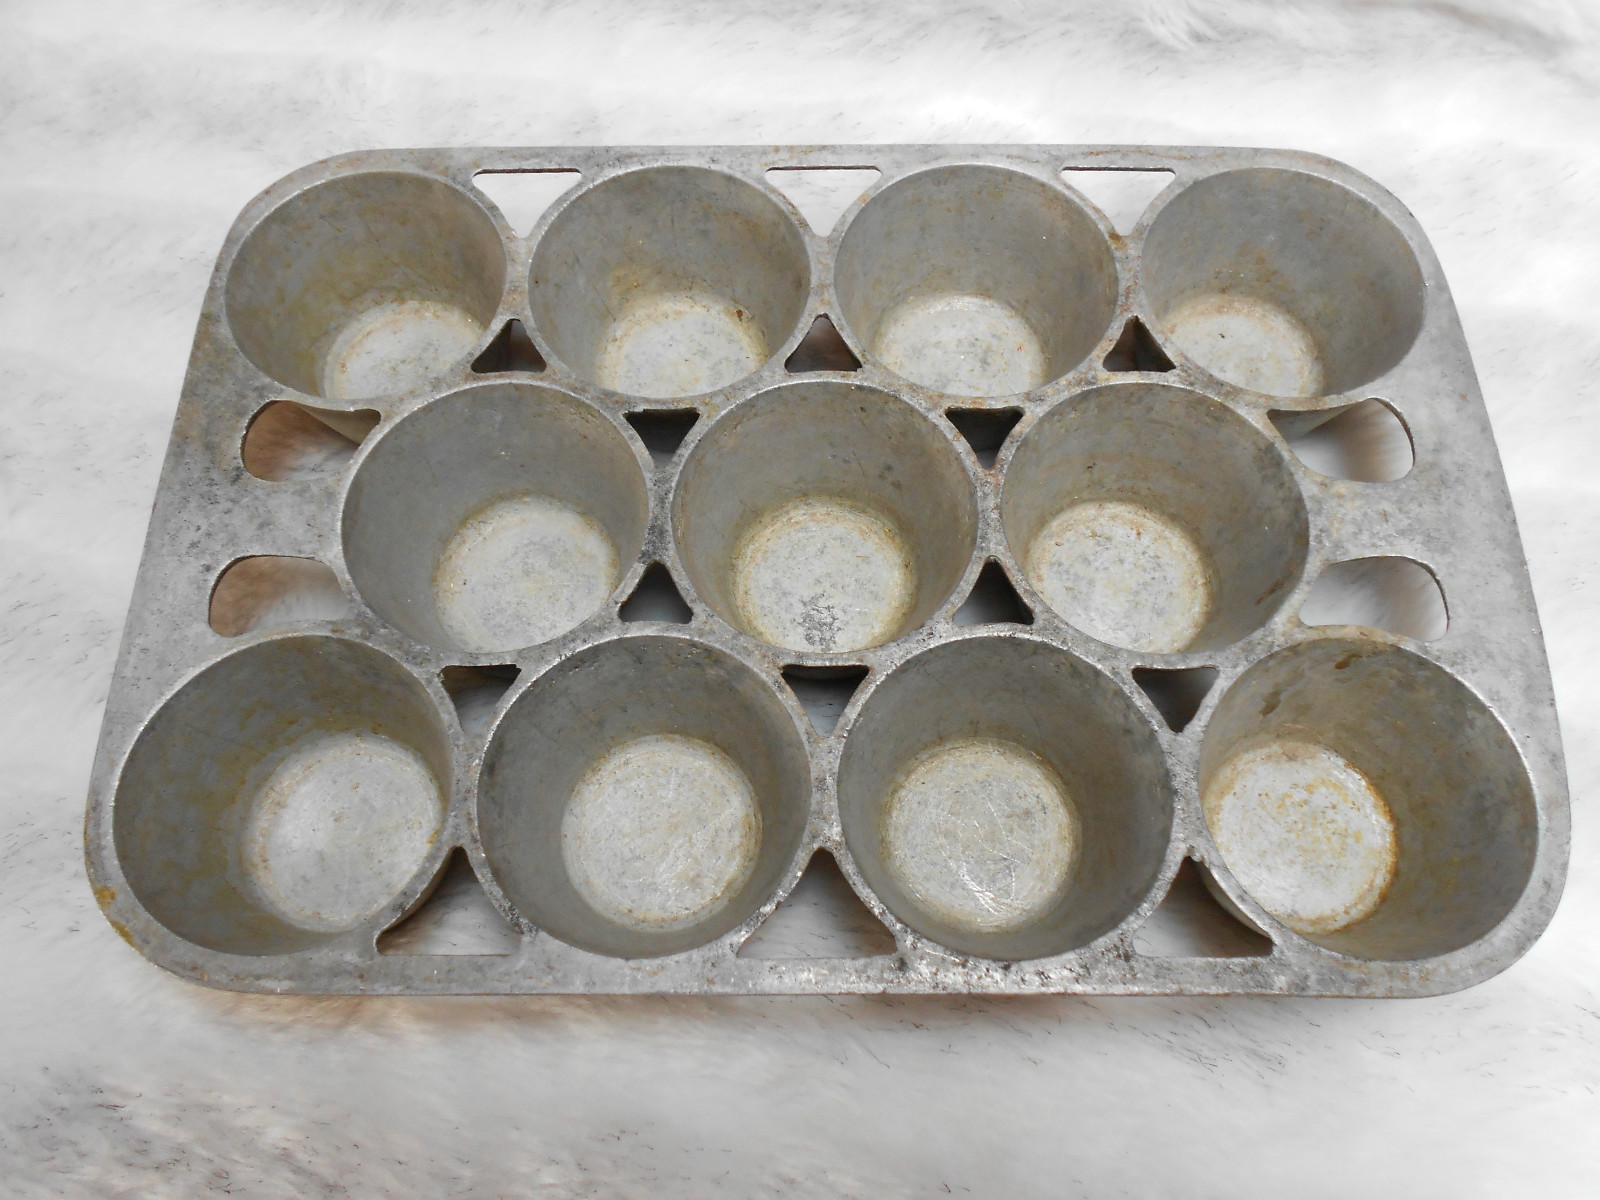 Erie Muffin Pan top